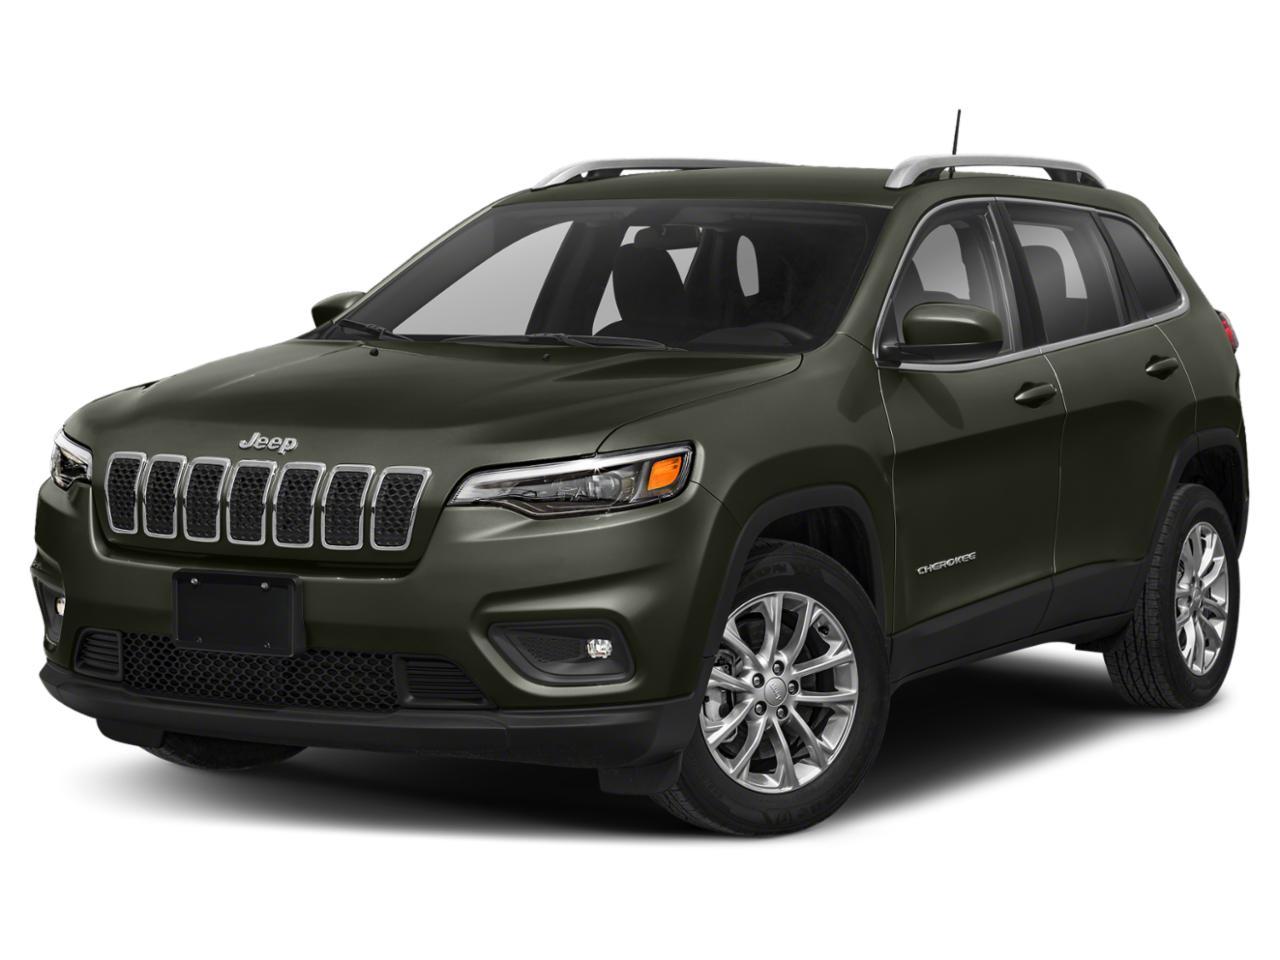 Used 2019 Jeep Cherokee Latitude Plus with VIN 1C4PJMLB0KD295273 for sale in Two Harbors, Minnesota